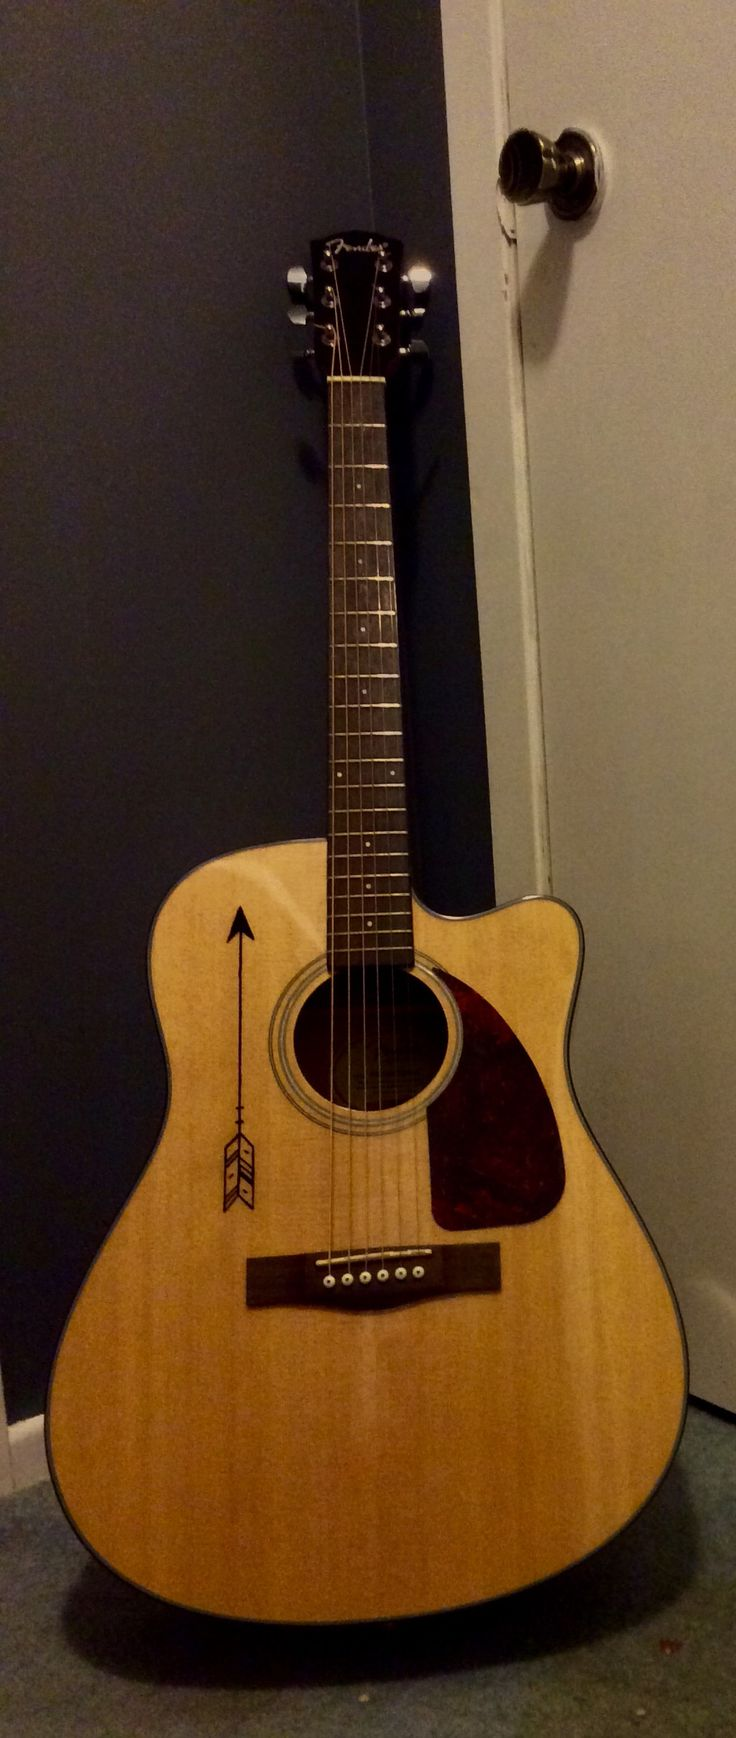 The 25 best fender acoustic ideas on pinterest fender for Acoustic guitar decoration ideas